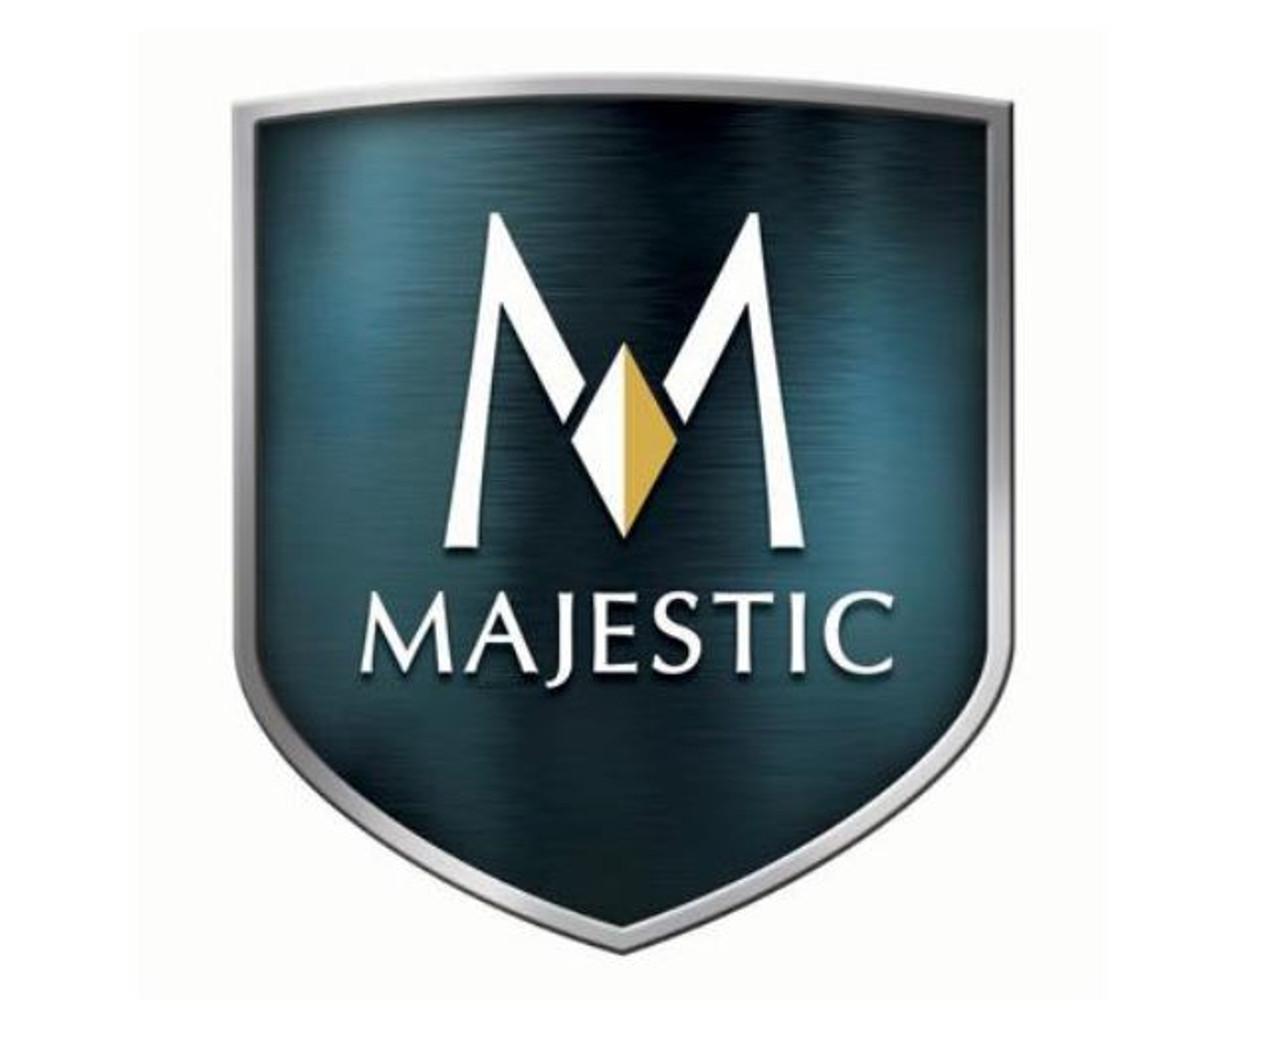 "Majestic   36"" Length Round Rigid Pipe - 6GV36 (Gas Fireplace - 6"" B-Vent)"